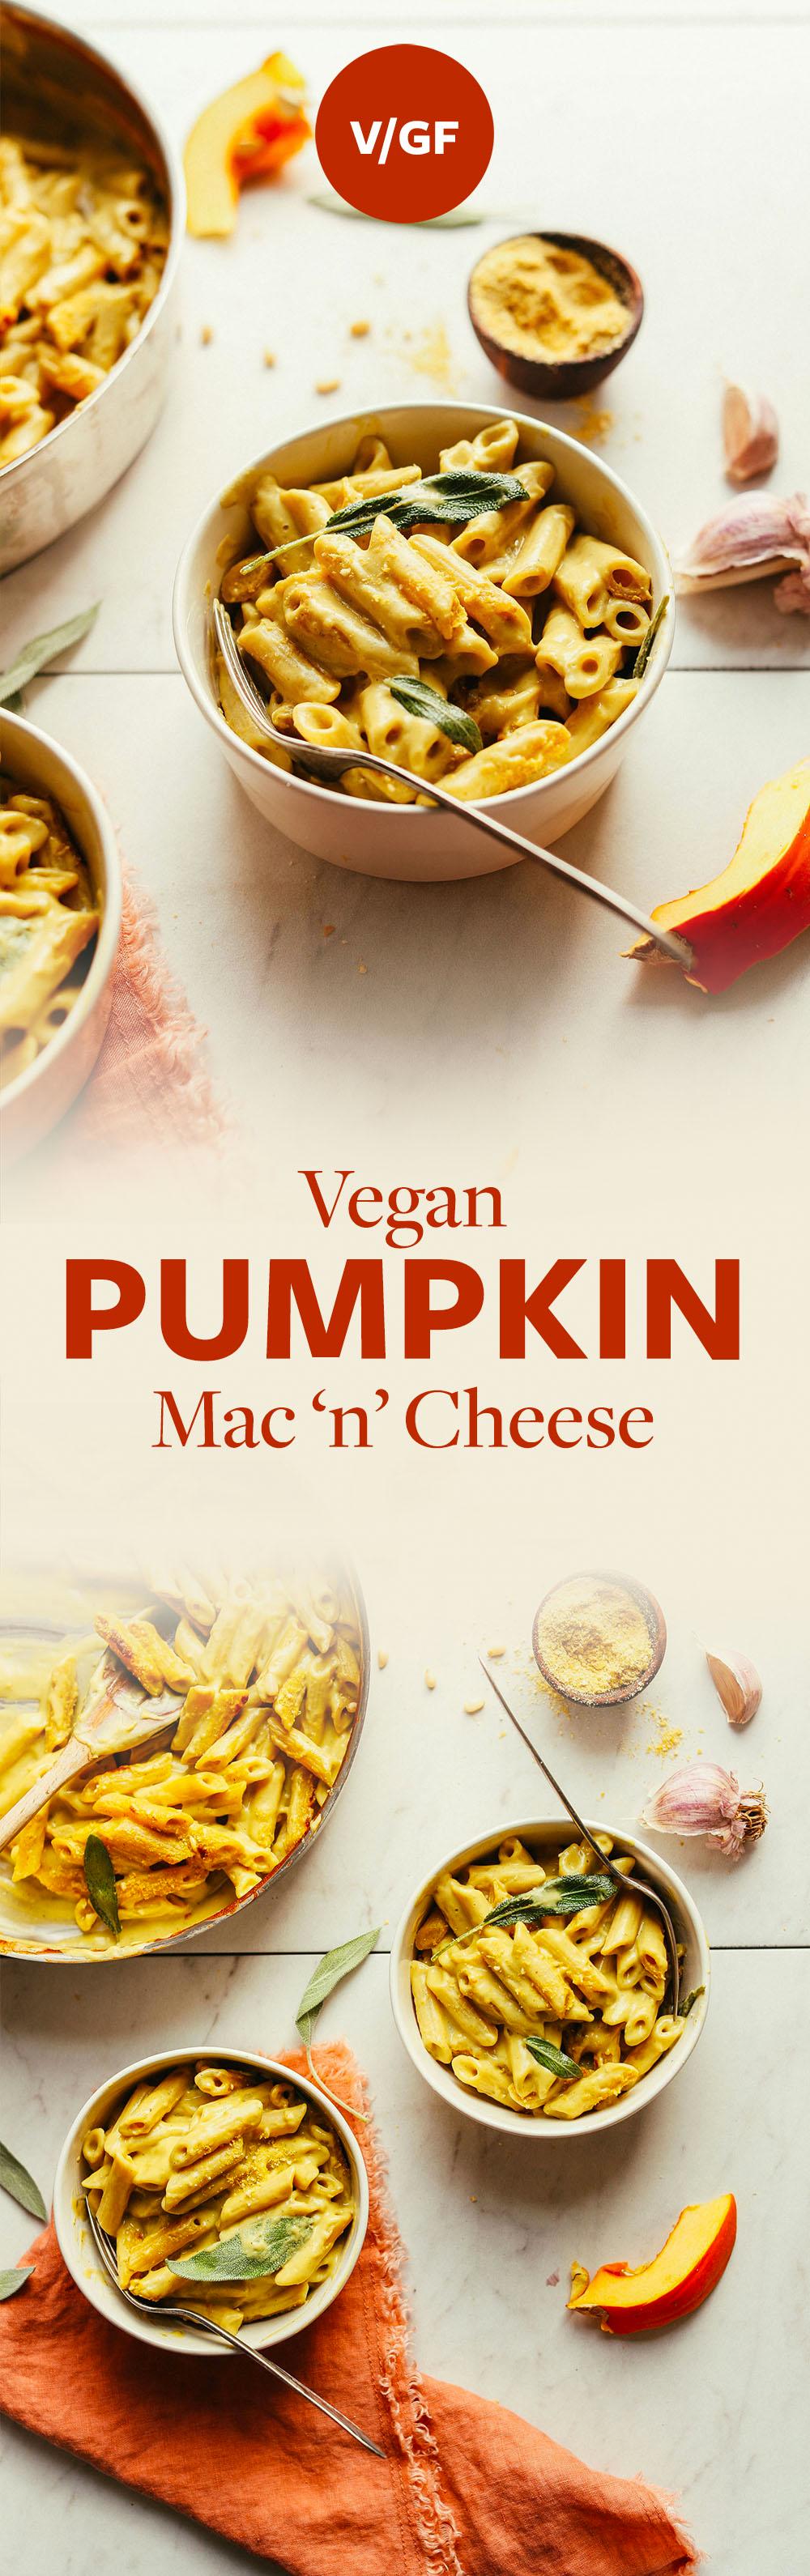 Vegan Pumpkin Mac N Cheese Minimalist Baker Recipes Recipe Pumpkin Mac And Cheese Vegan Pumpkin Recipes